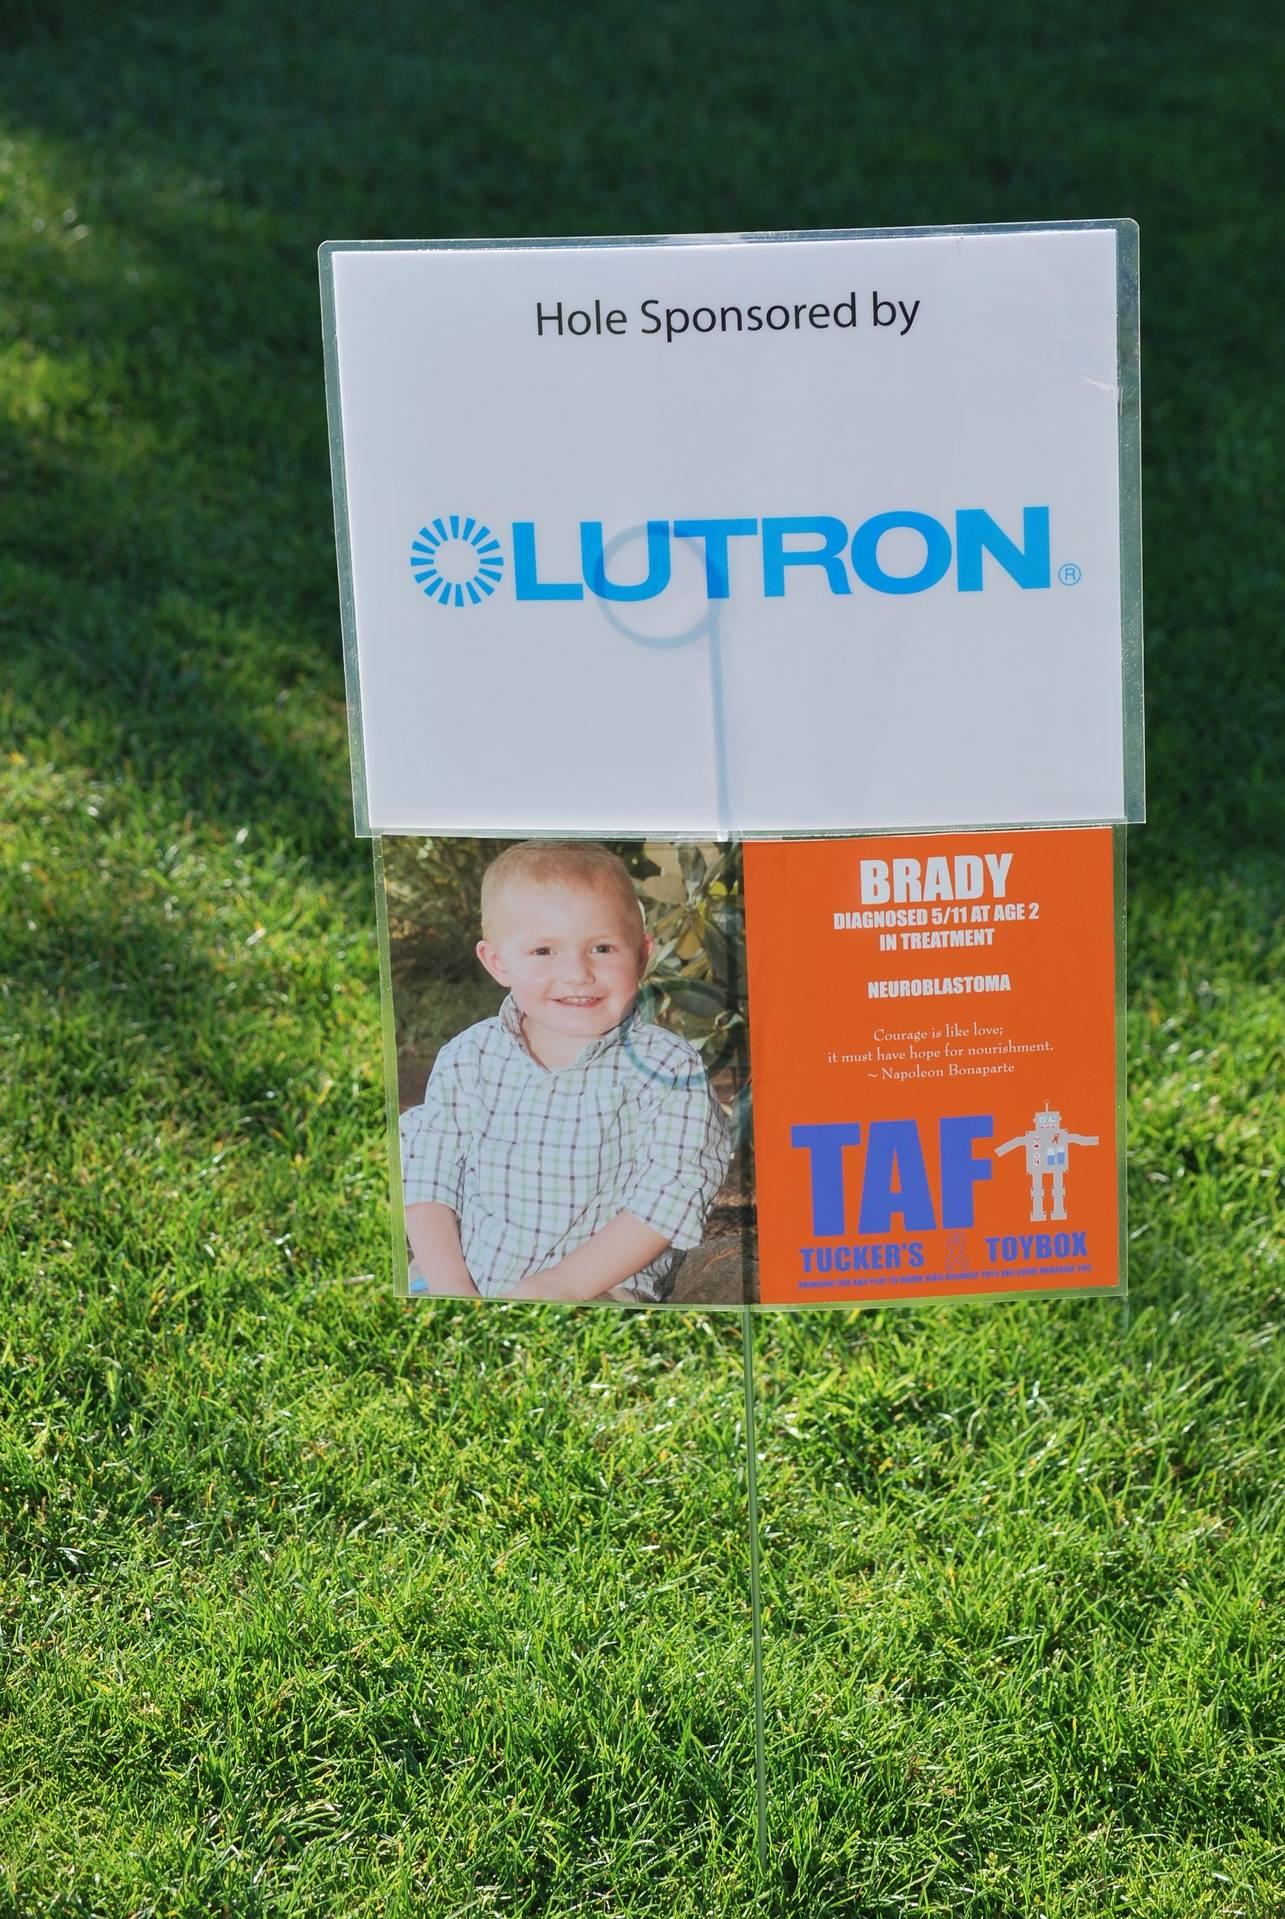 Hole Sponsored by Lutron